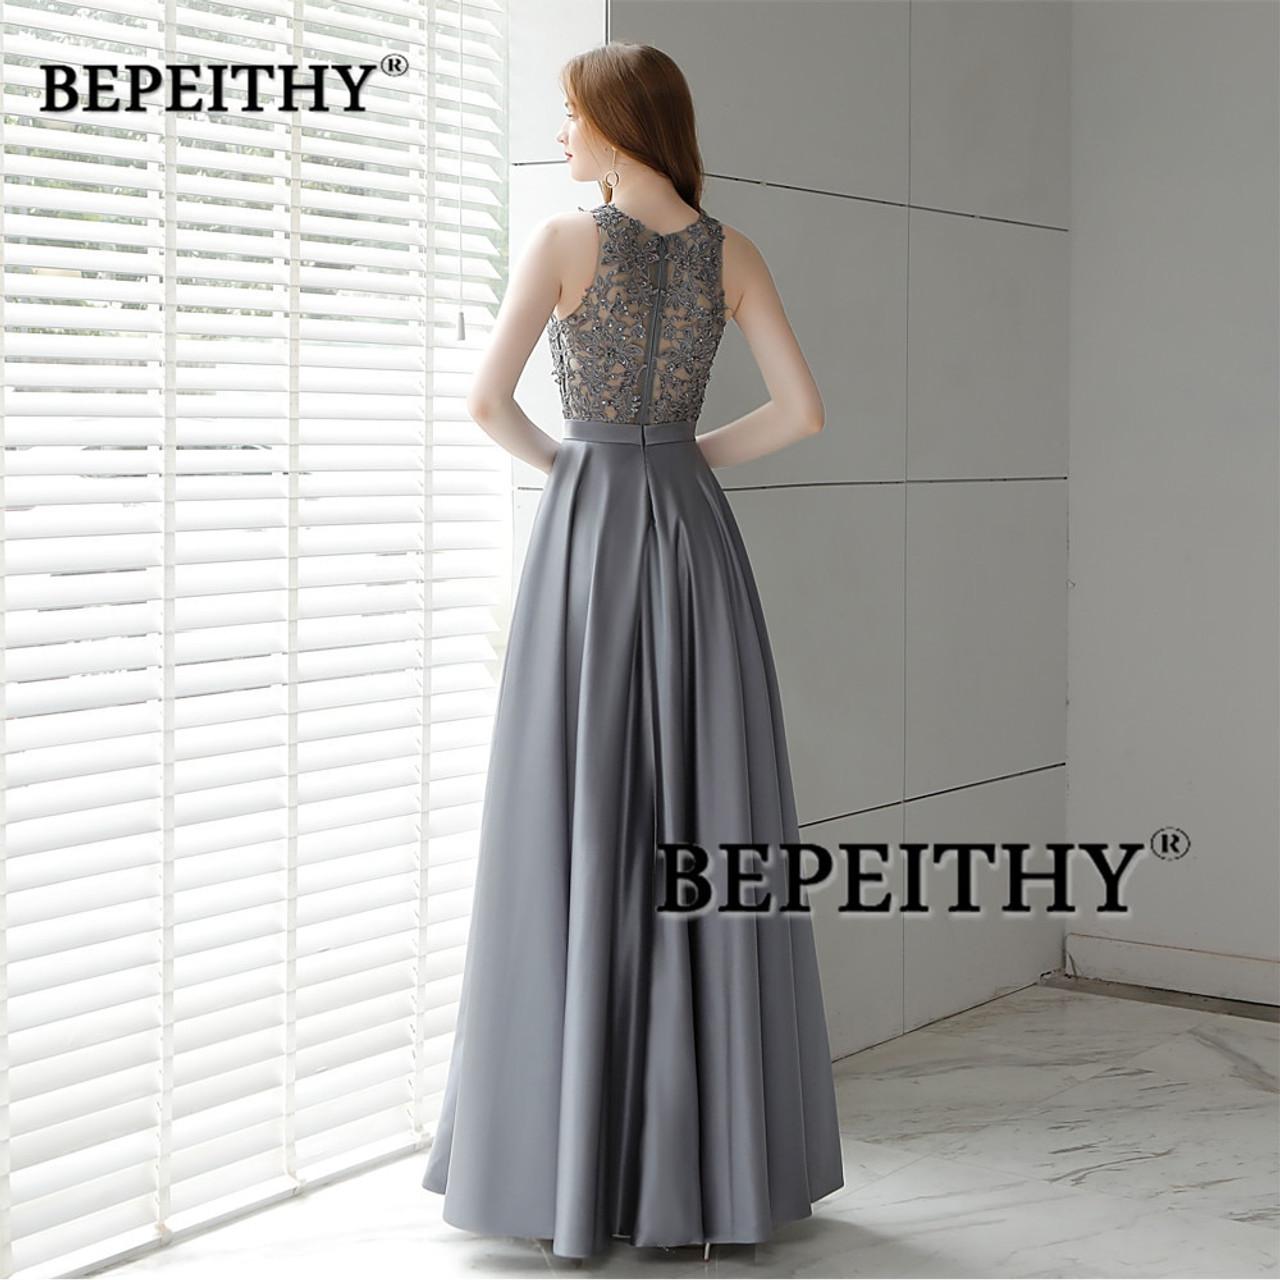 6861581c28546 Vestido De Festa Gray Long Evening Dress 2018 O Neck Lace Top Vintage  Elegant Prom Party Dresses Abendkleider Hot Sale